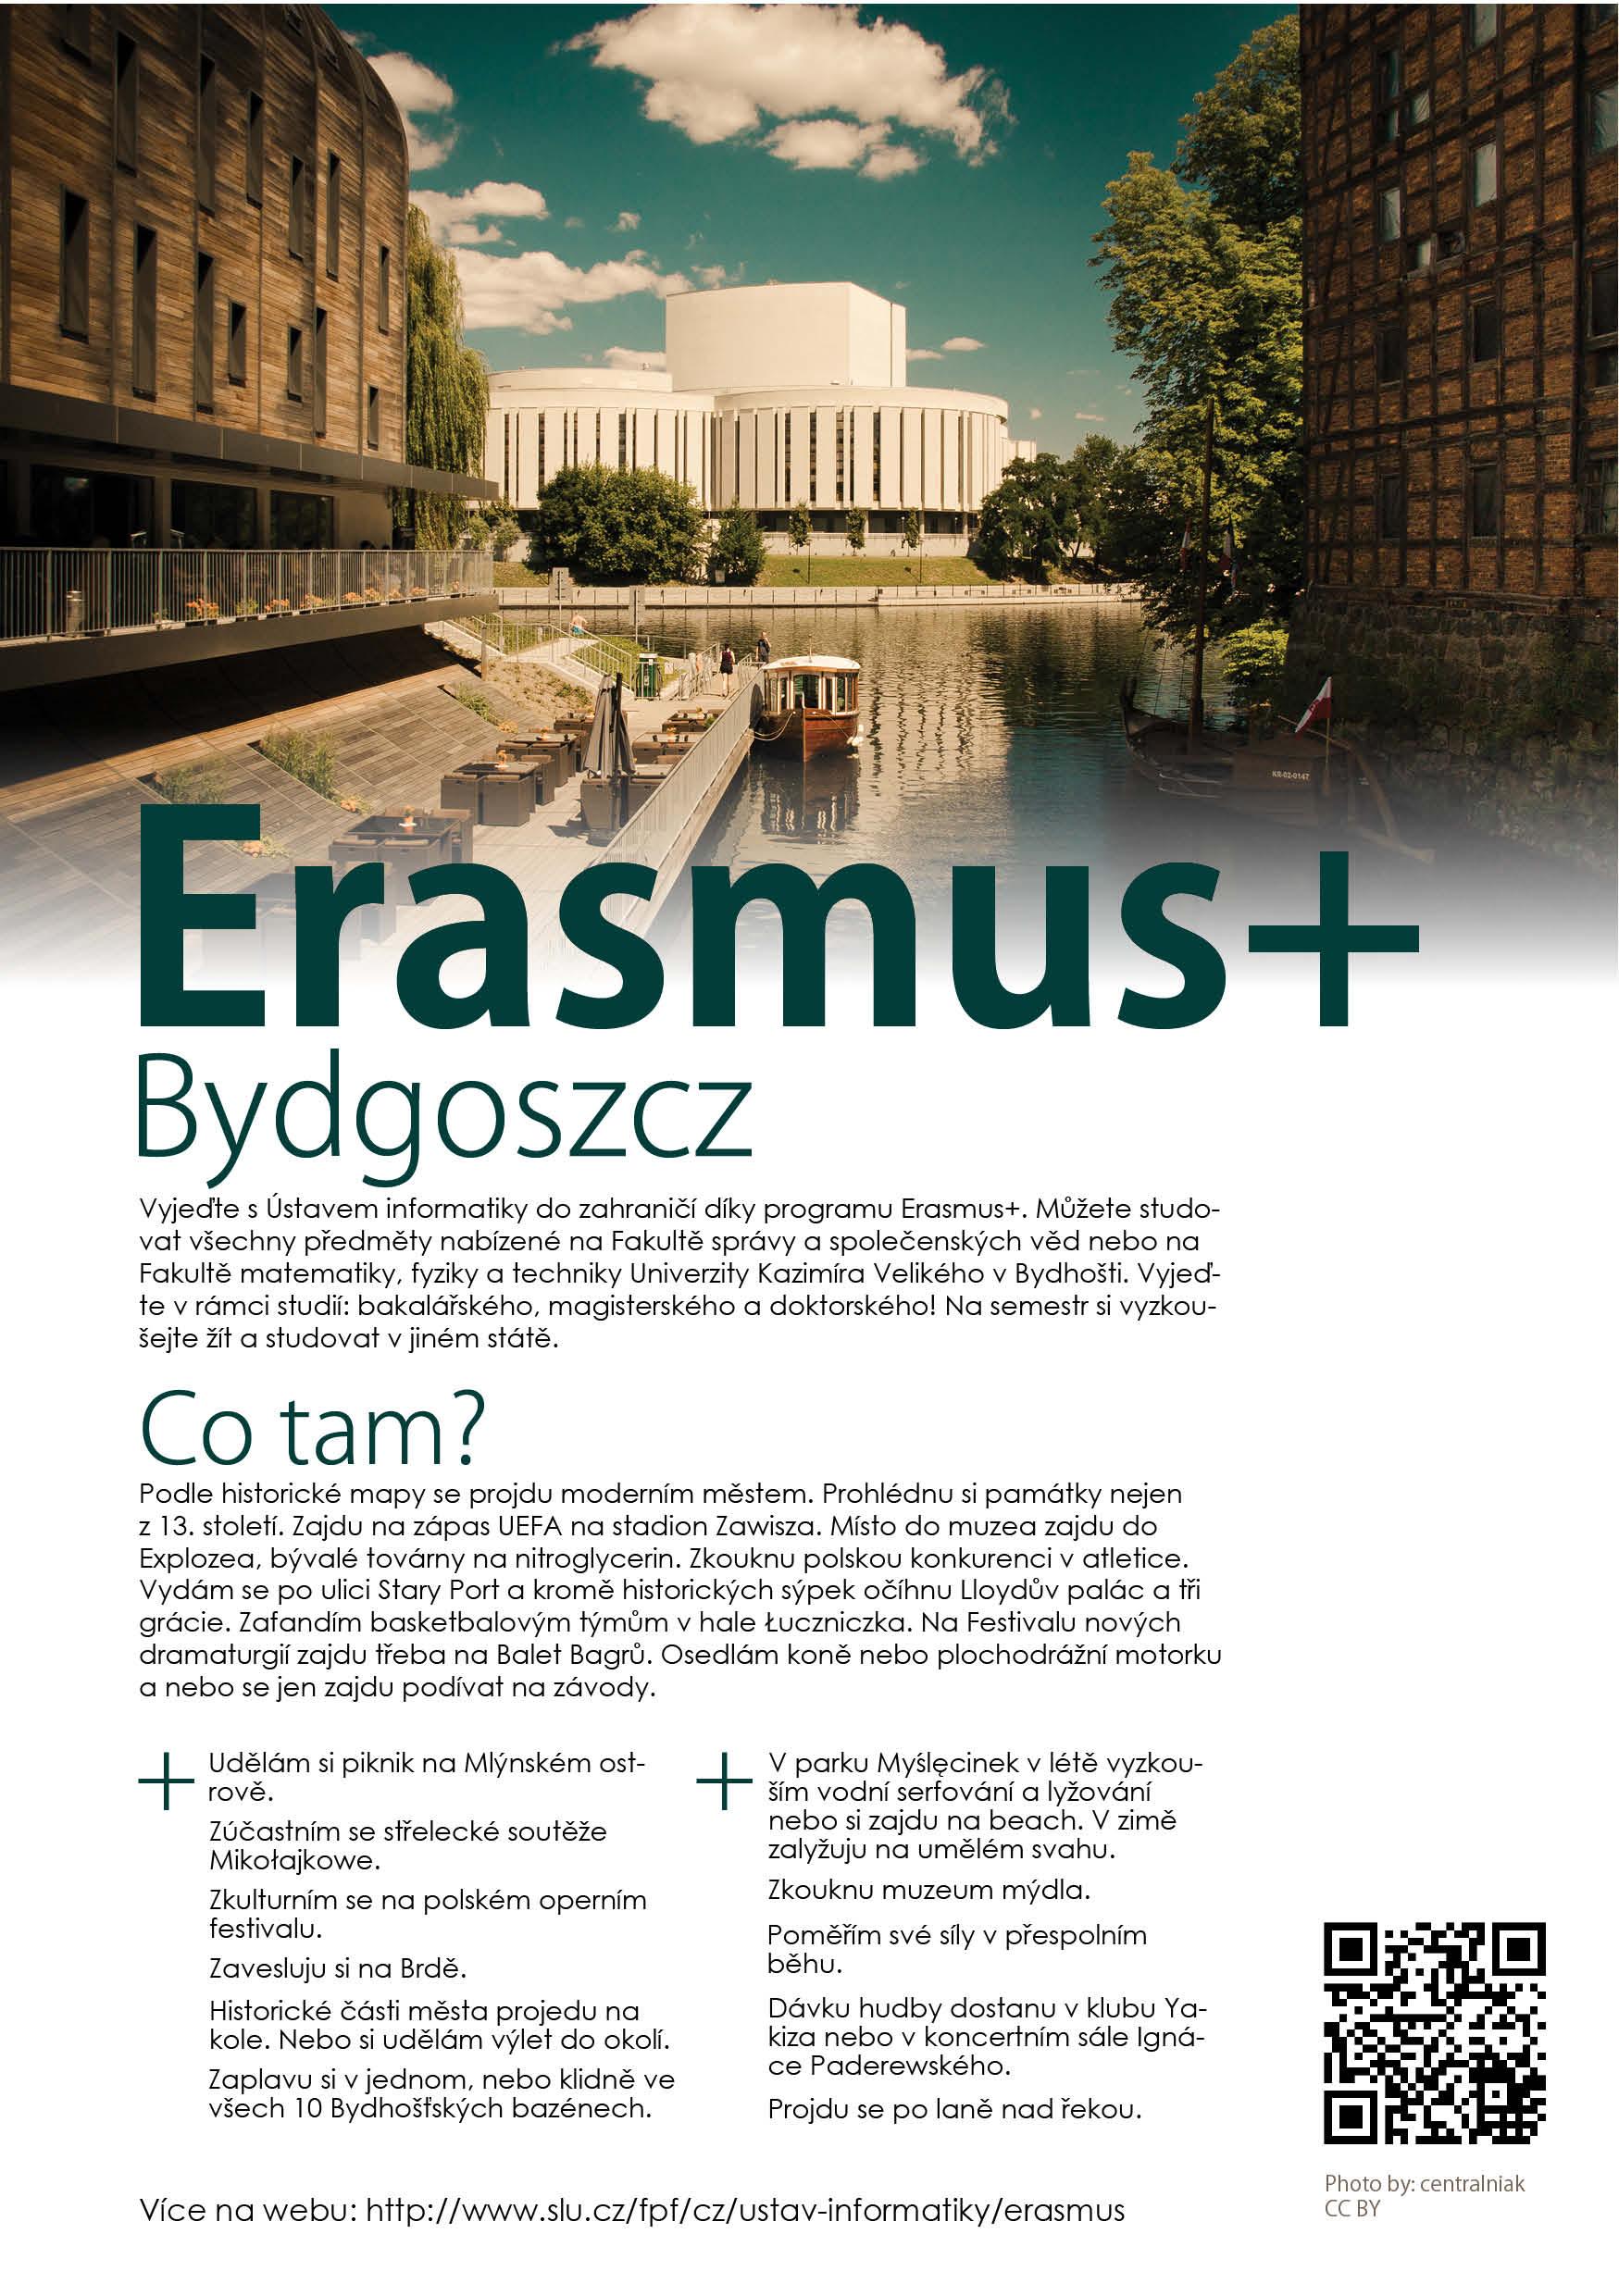 Erasmus - Bydgoszcz